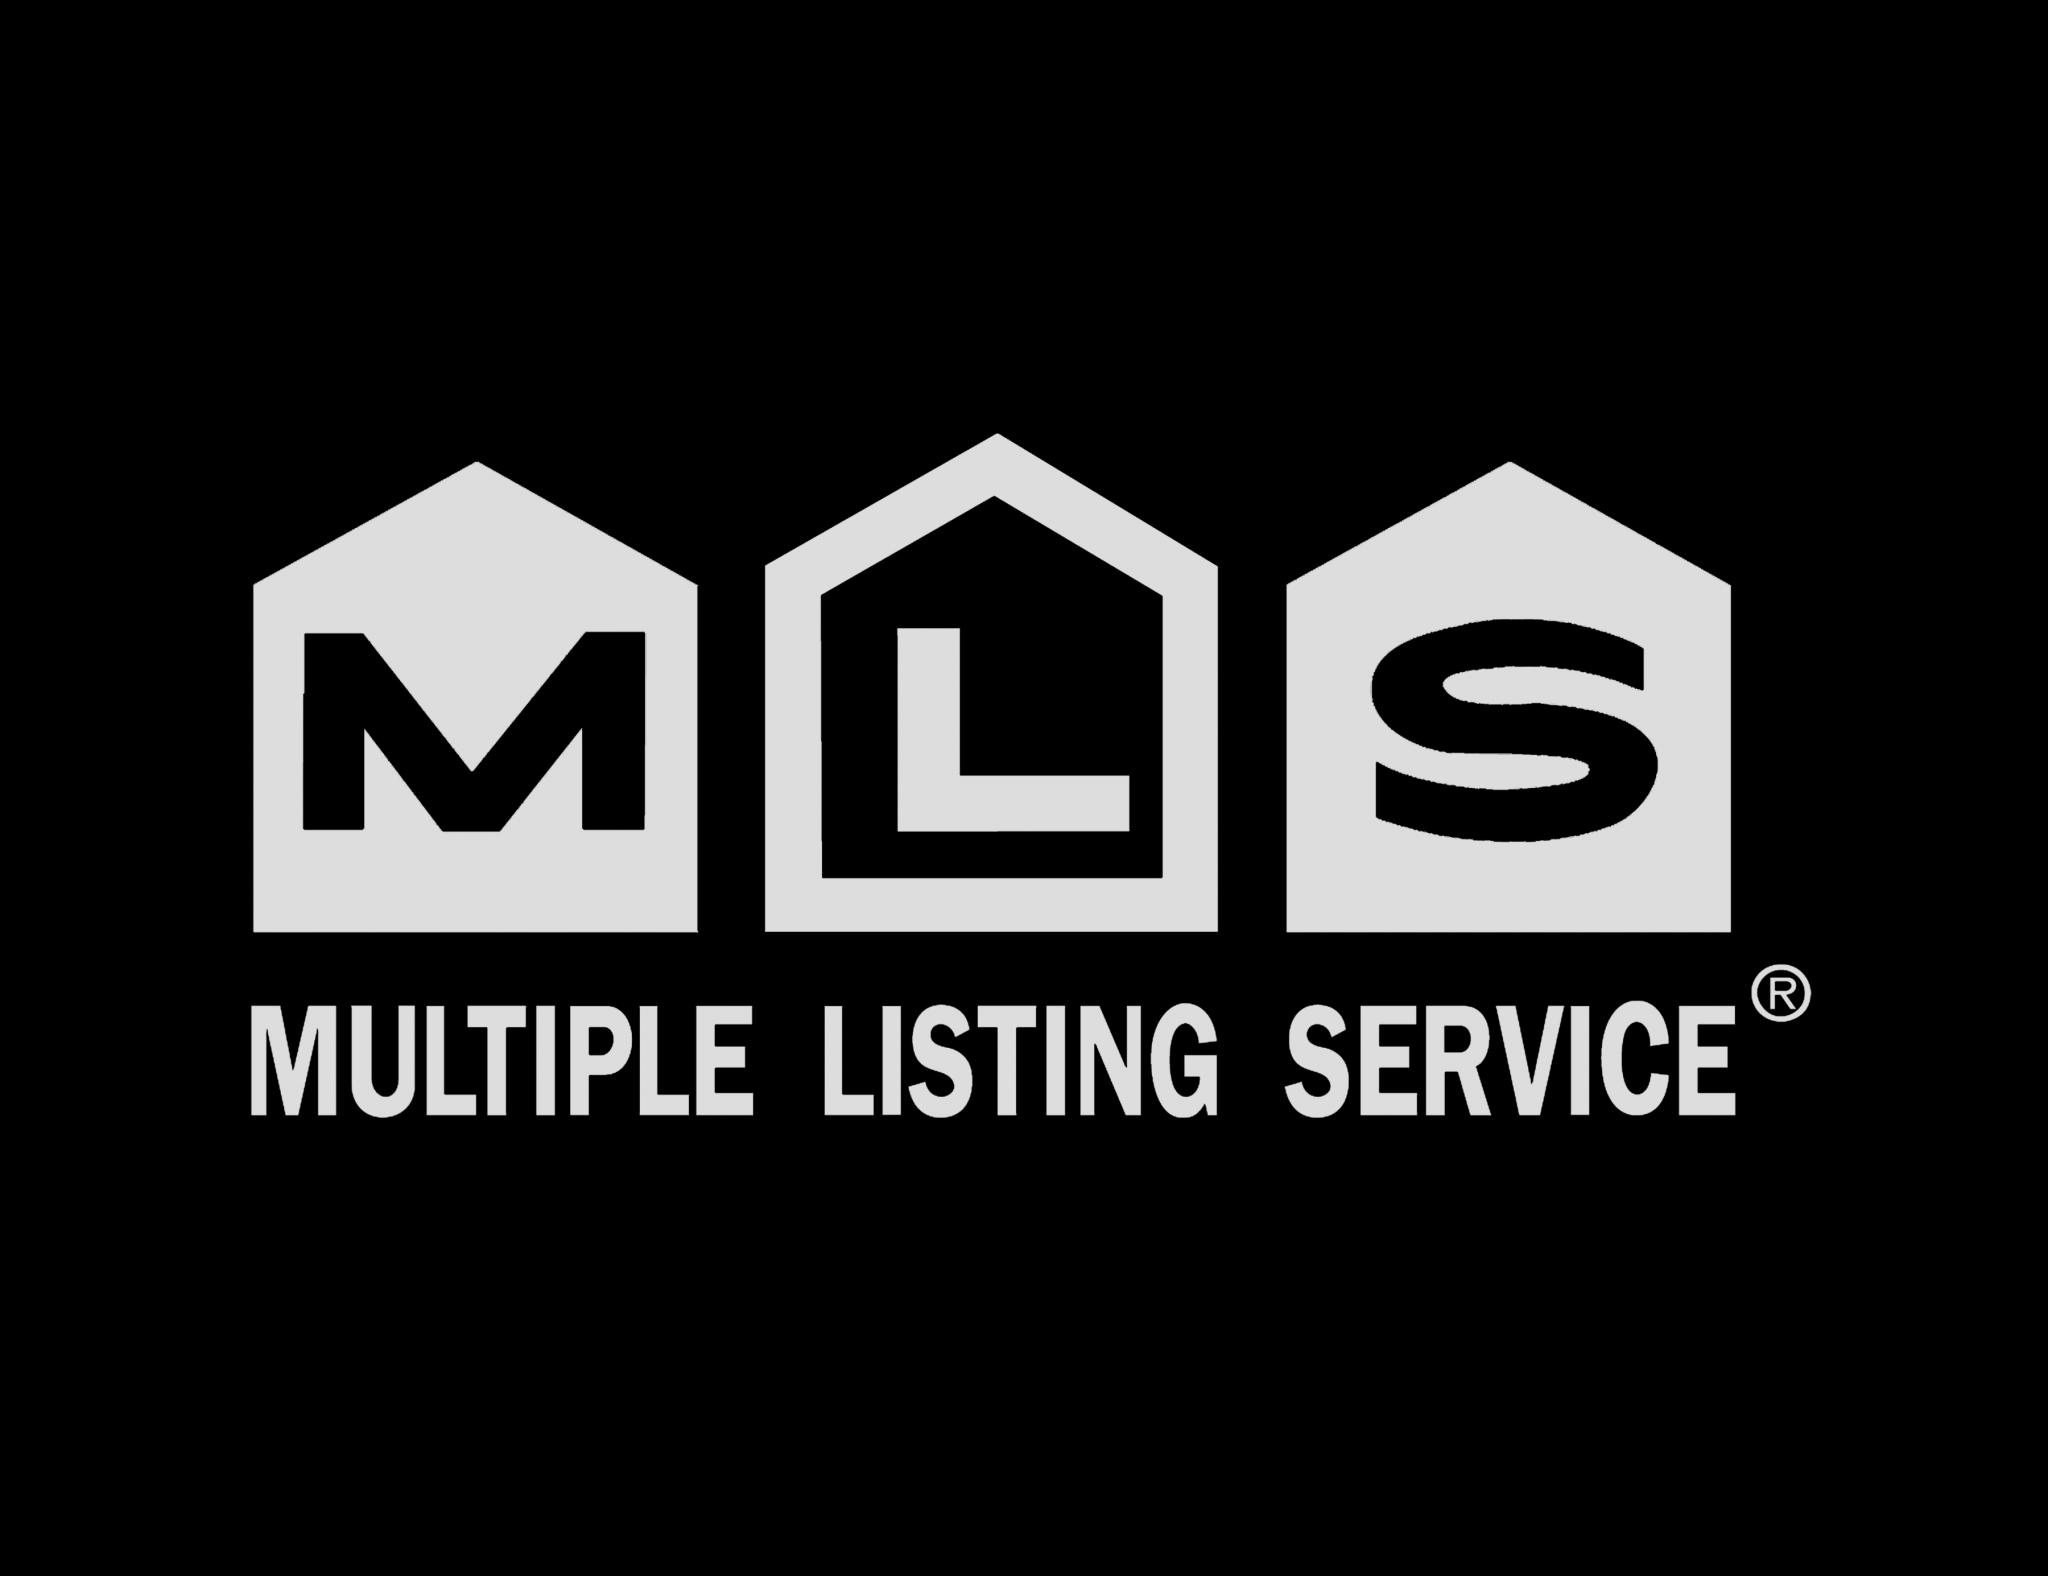 MLS Logo Multiple Listing Service Housing Real Estate Company Houses Symbols